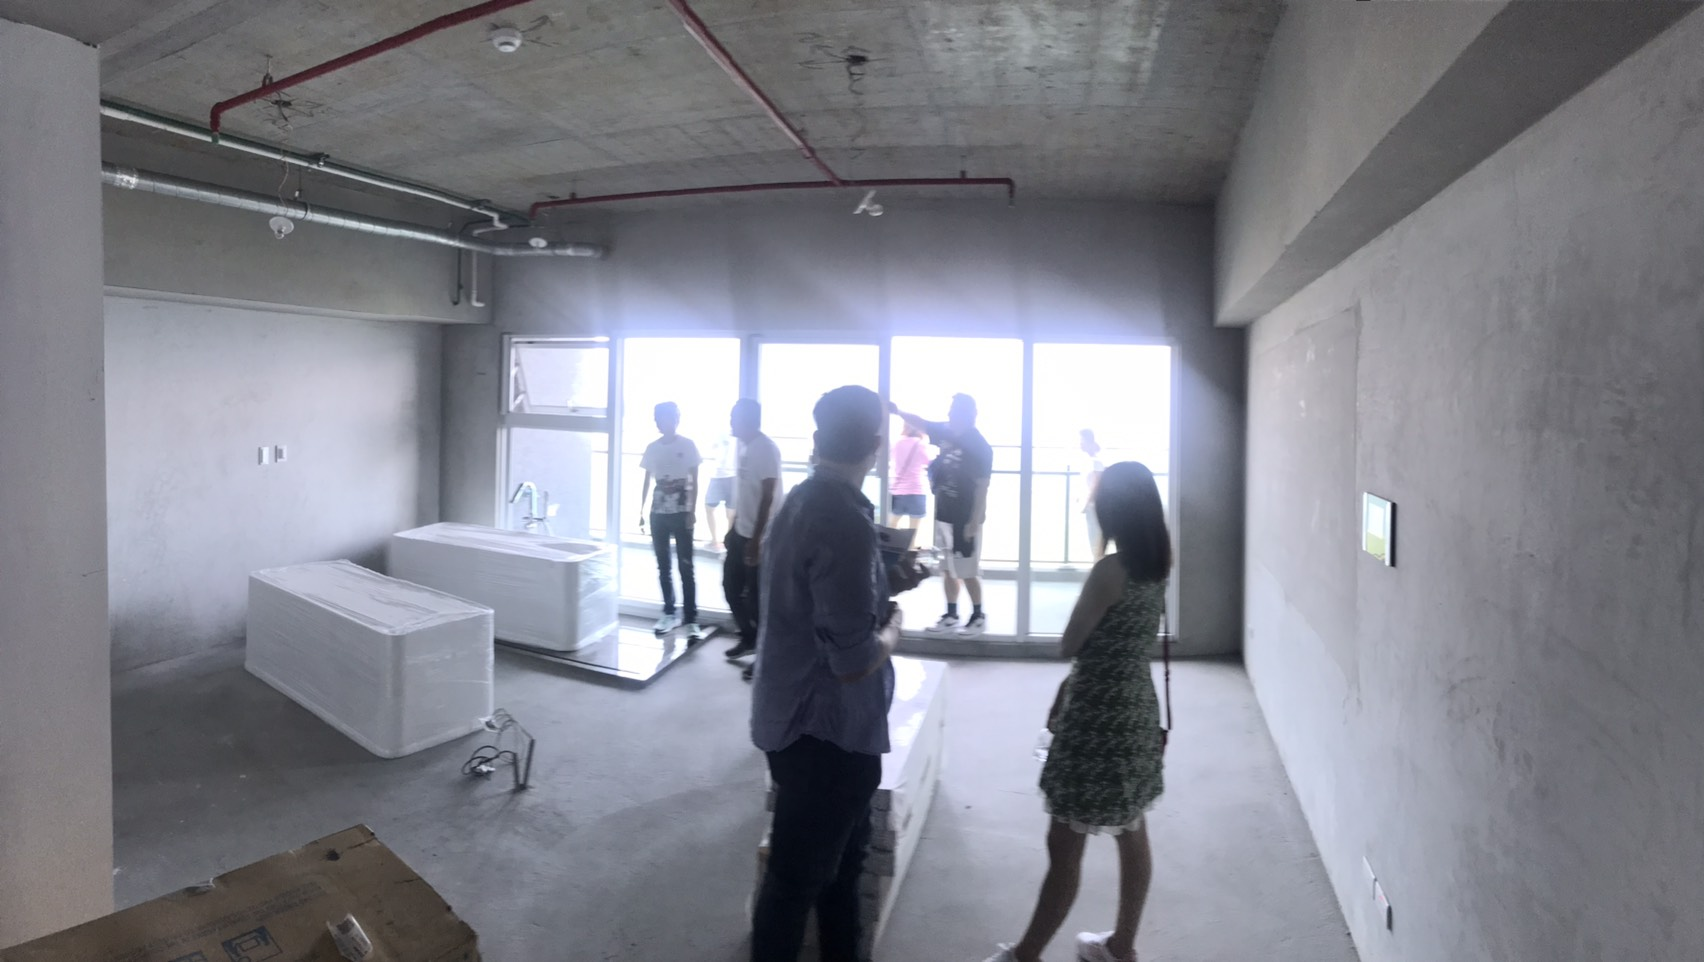 德築-DEZU-project-世界灣自宅裝修-architecture-interior-renovation-16